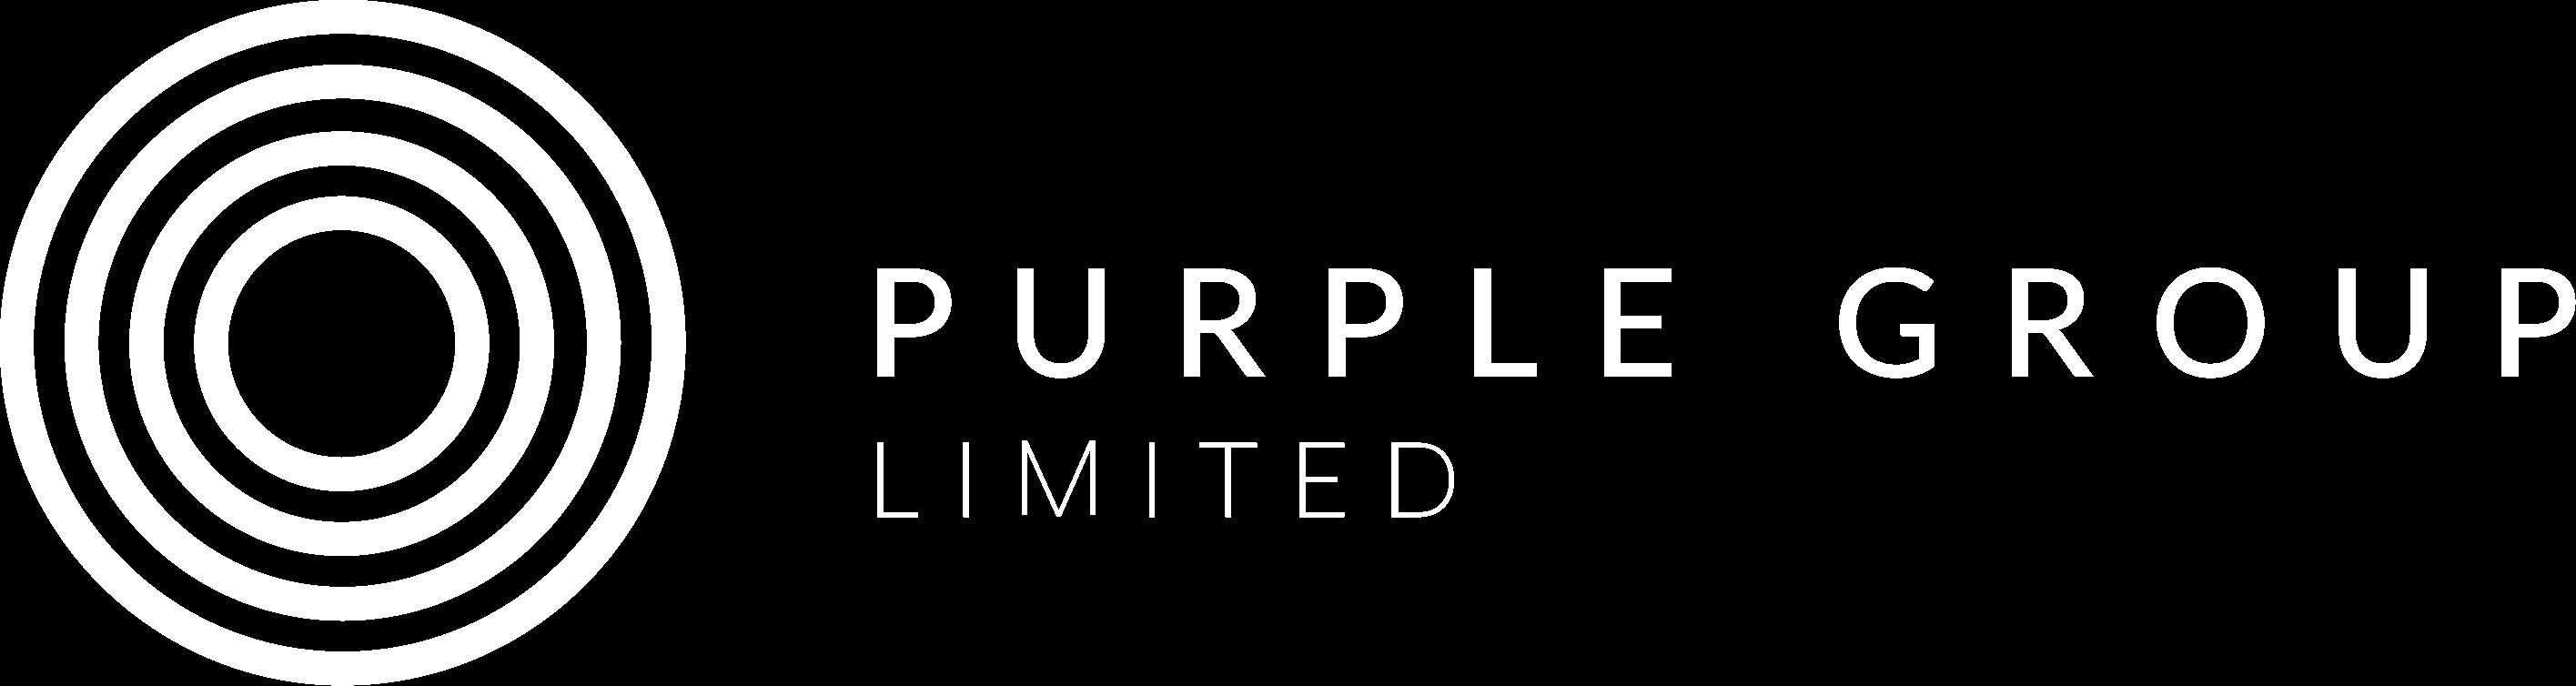 17 logo purple group